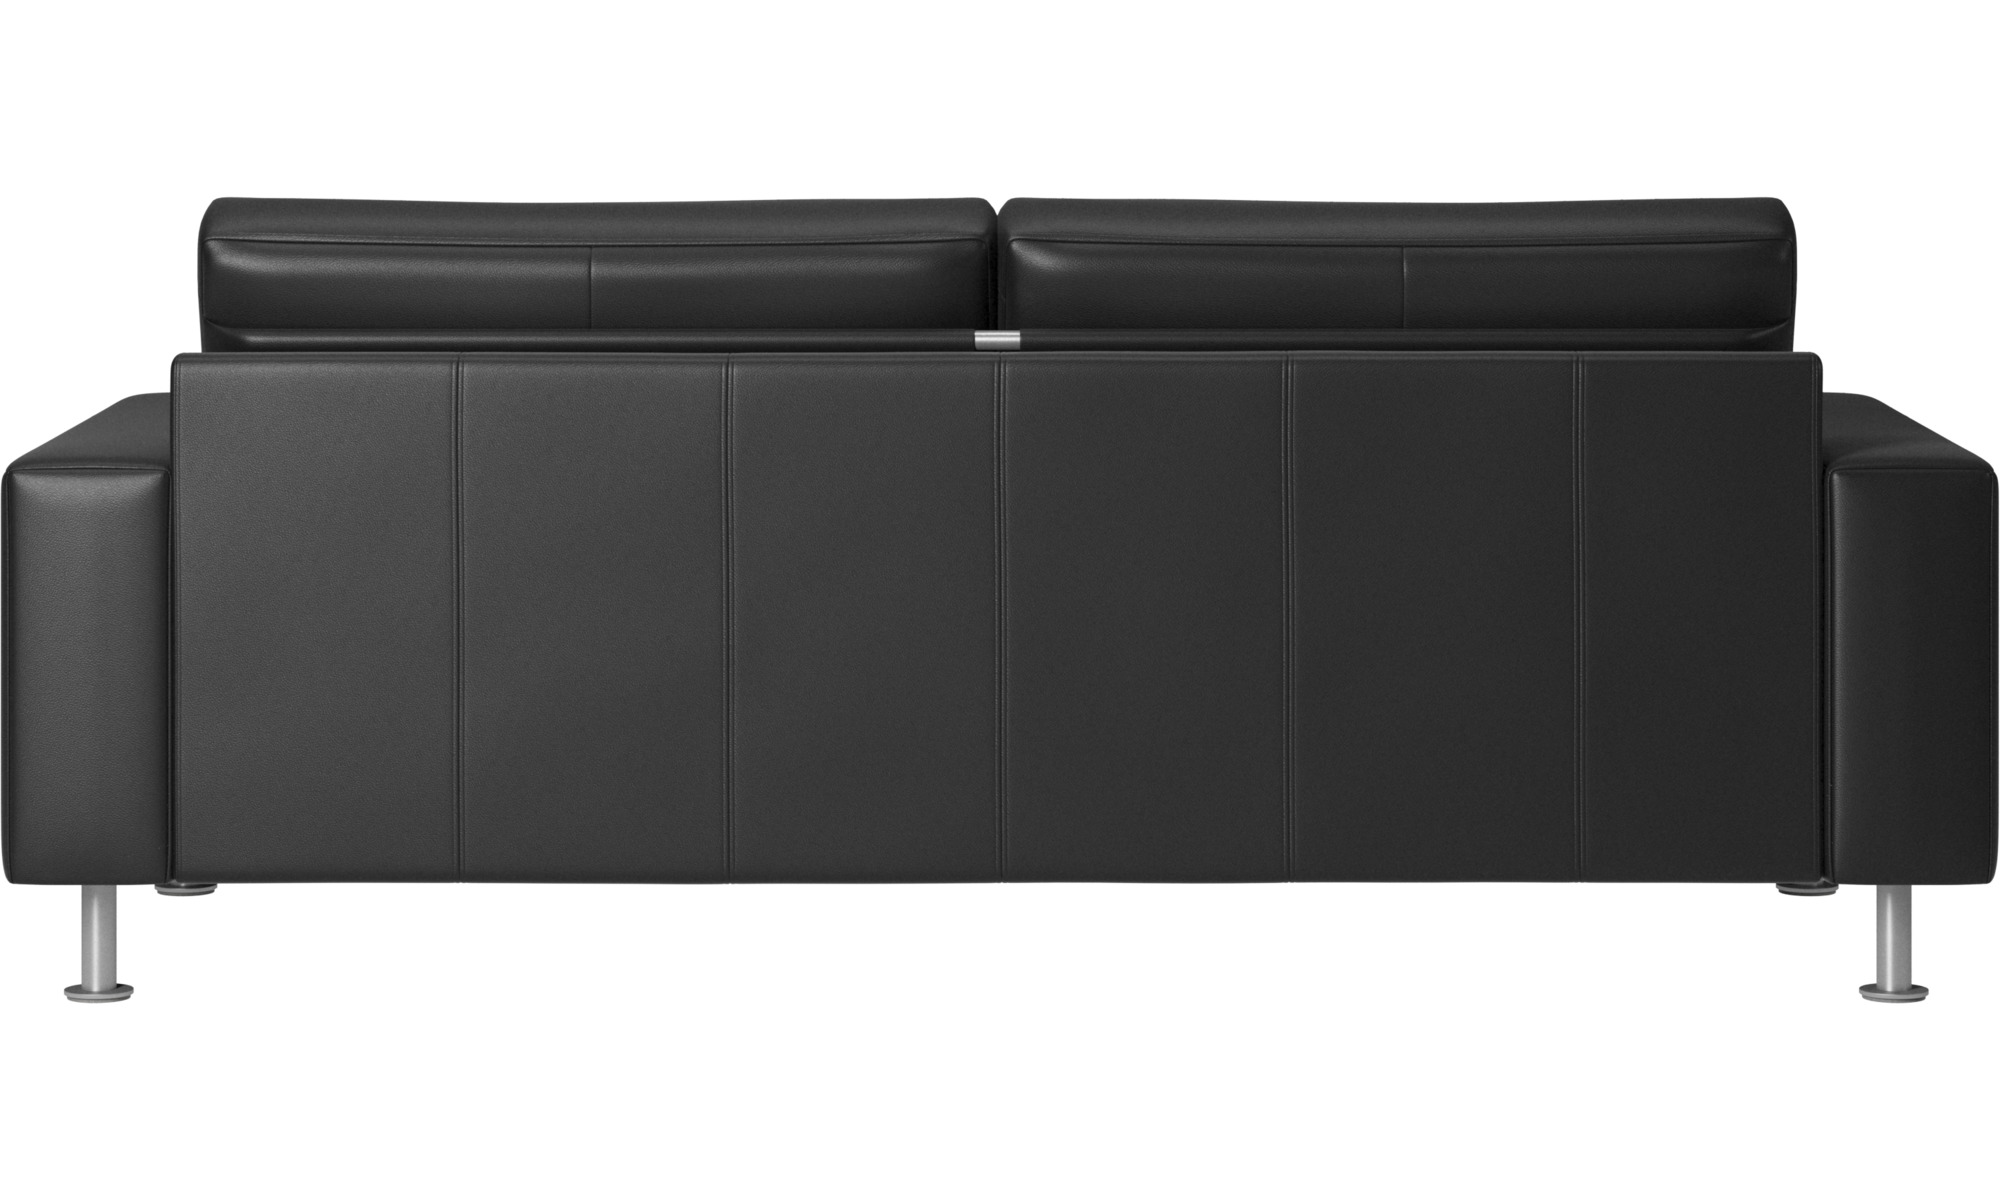 Sofa Beds Indivi 2 Bed Black Leather